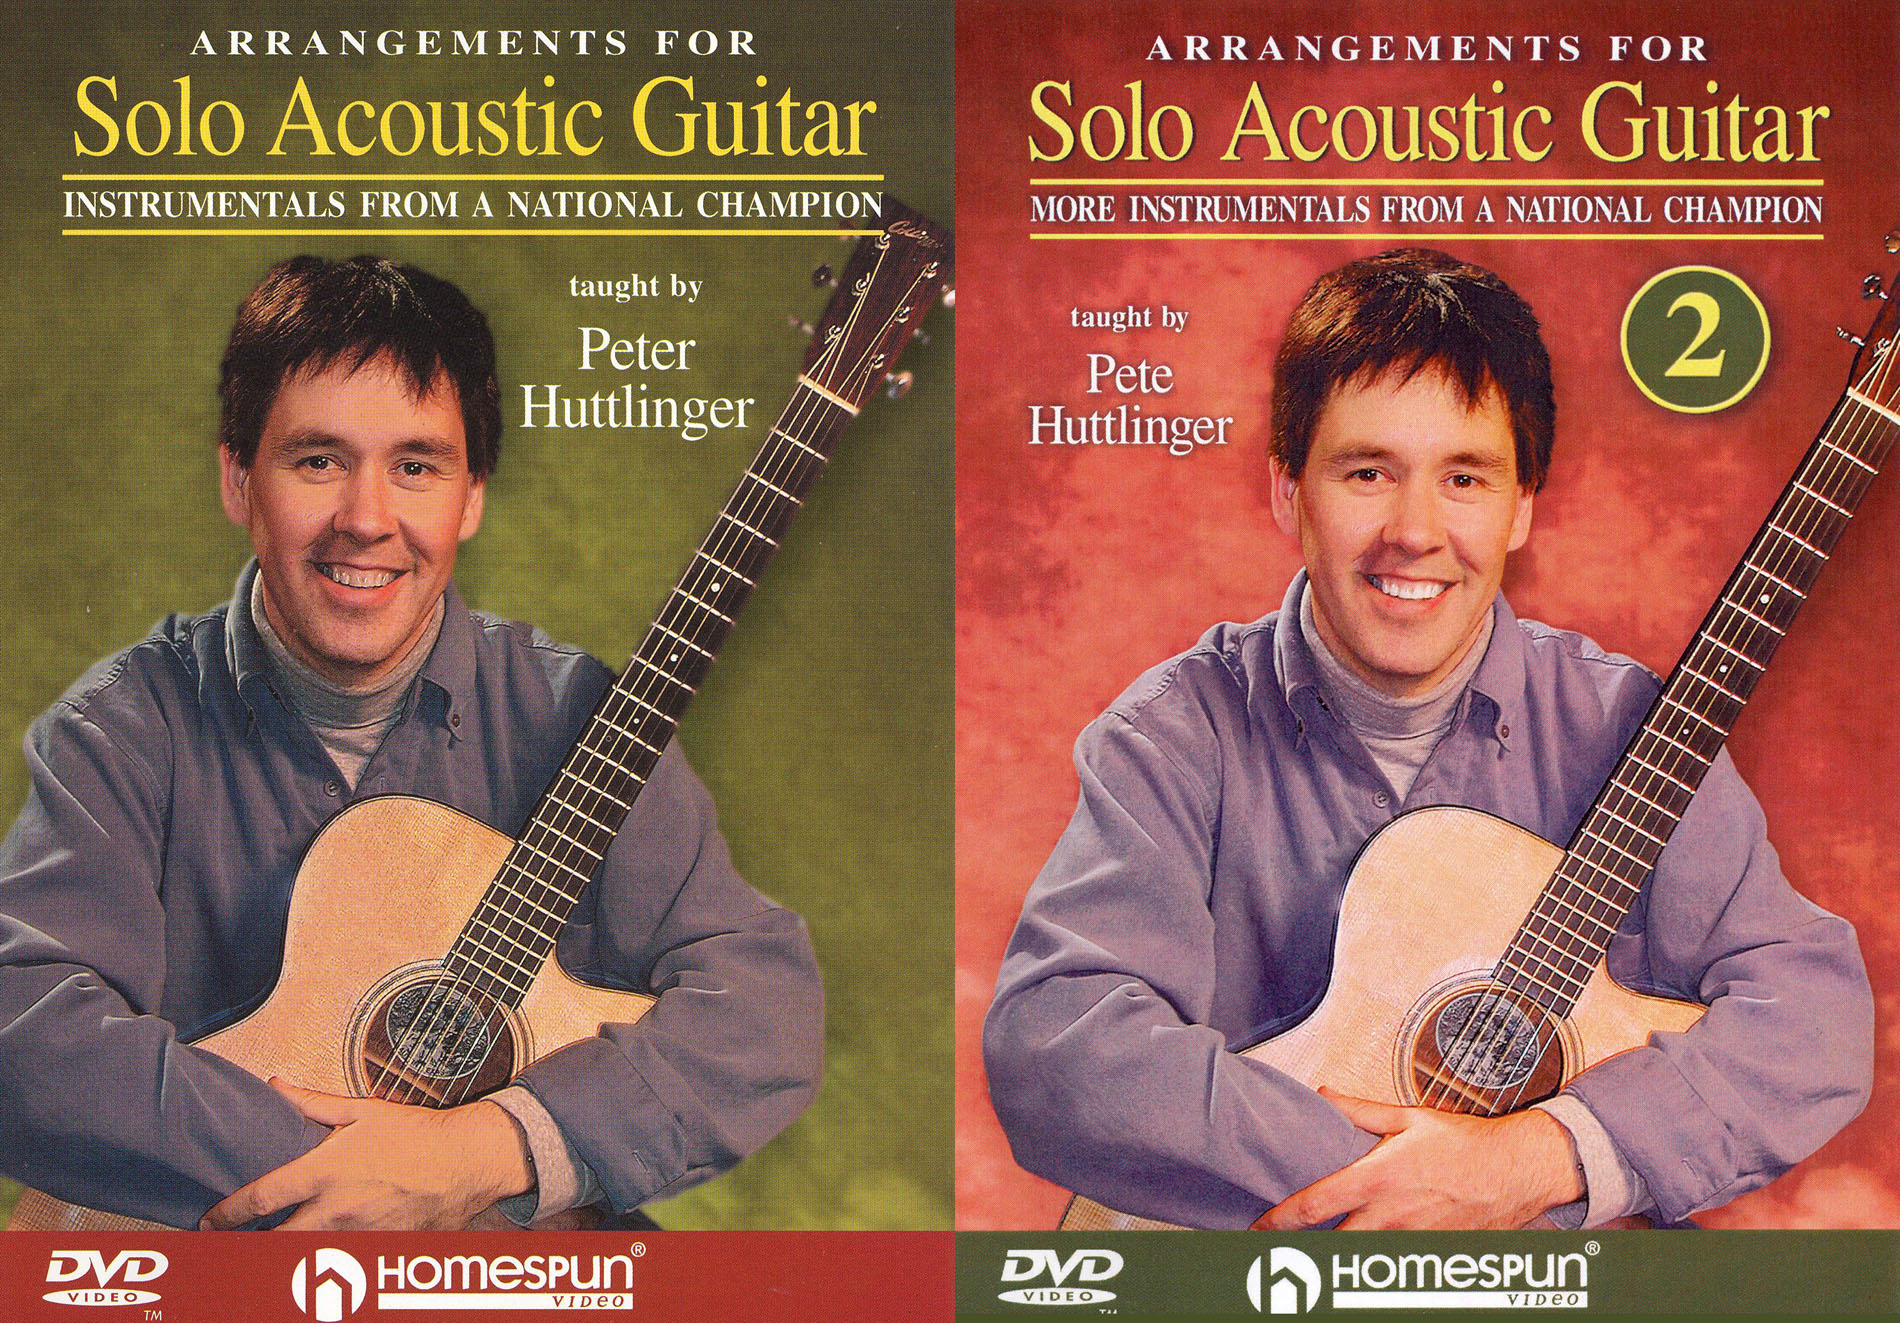 Peter Huttlinger: Arrangements for Solo Acoustic Guitar